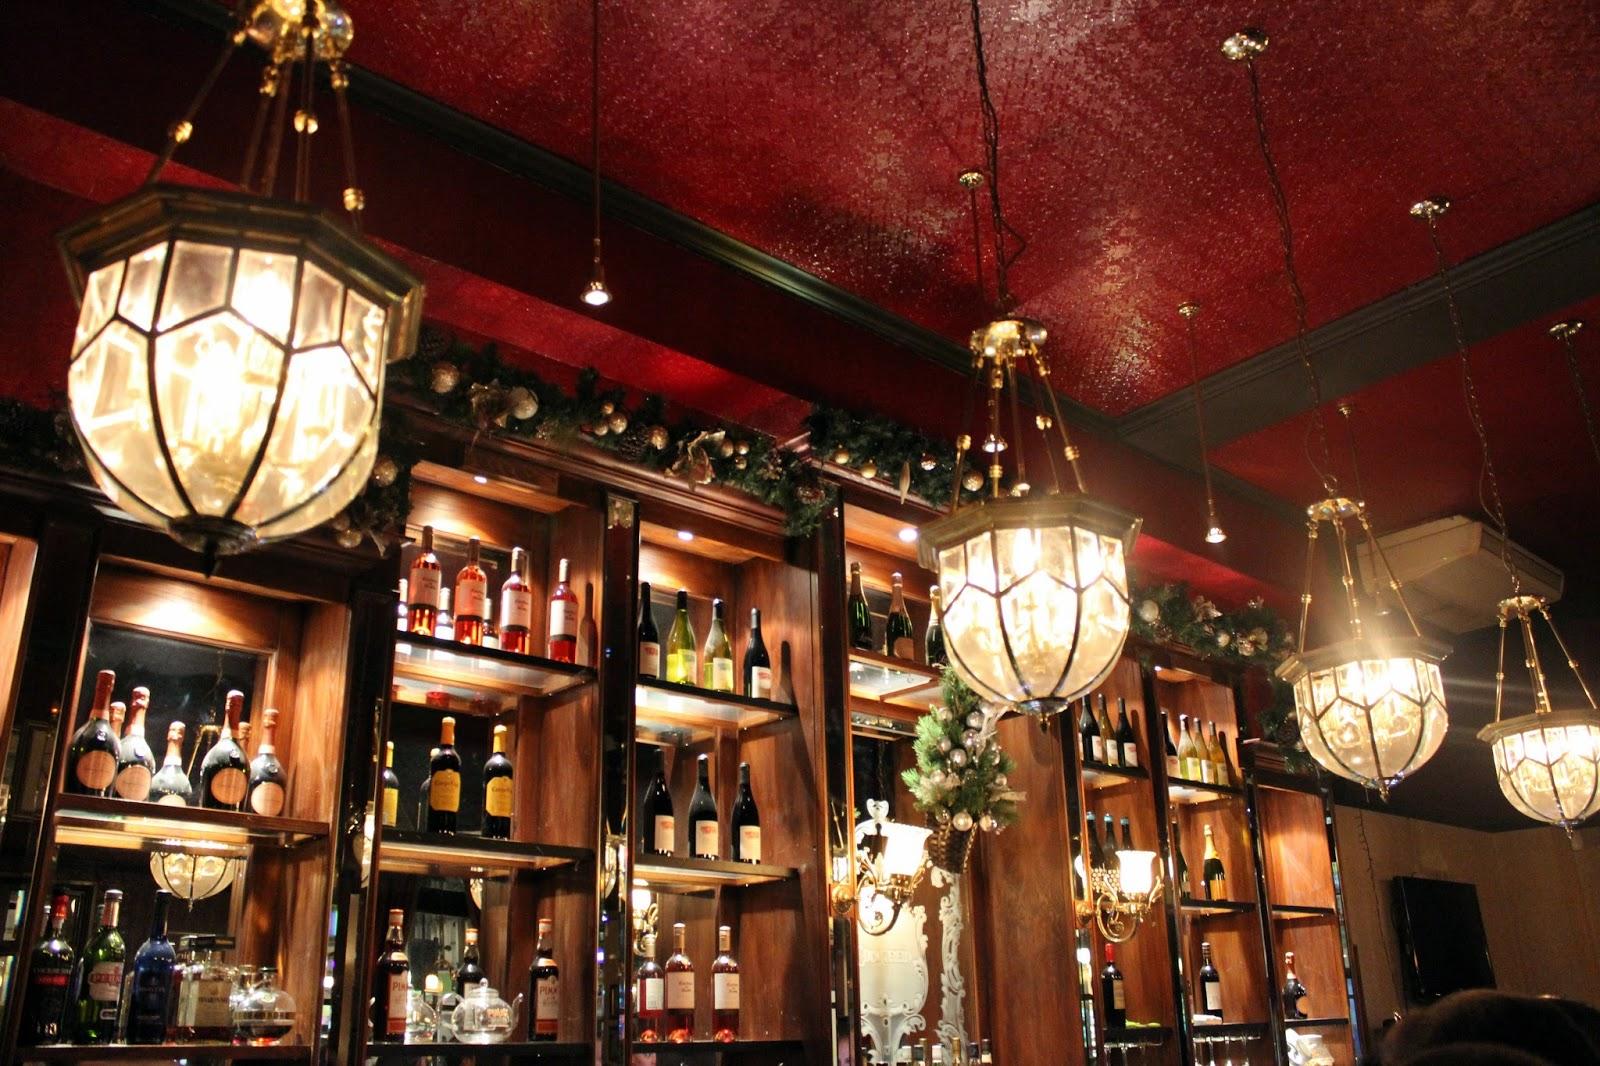 London Travel Diary Restaurants Pubs Empfehlung The Courtfield Kensington